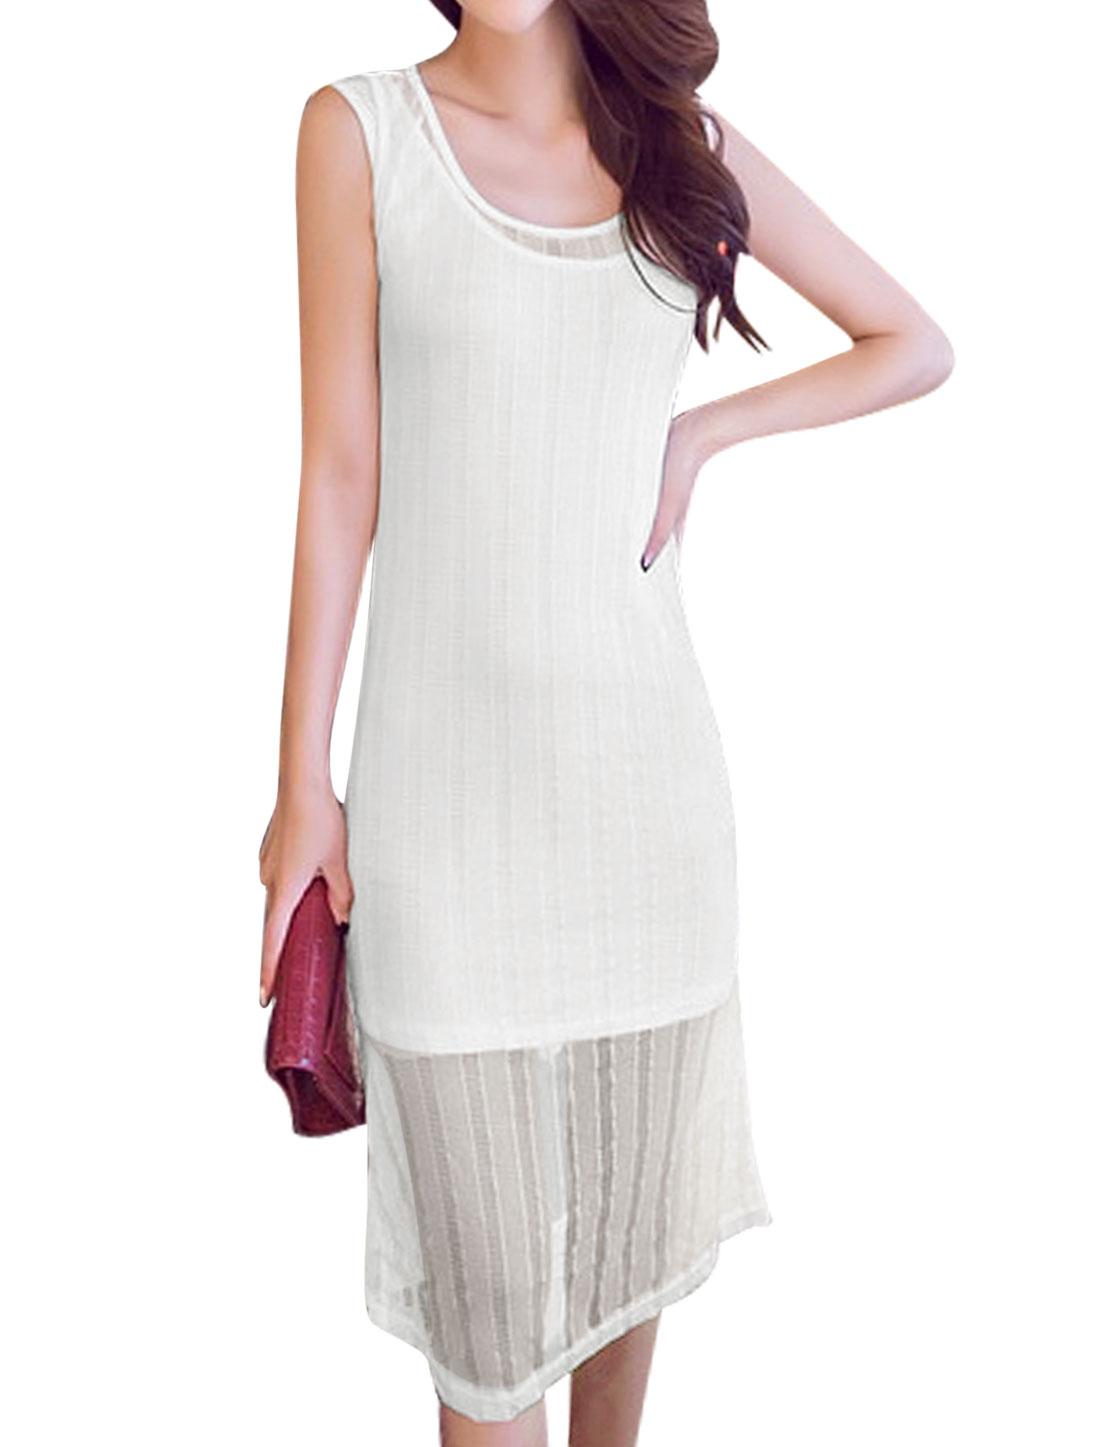 Women Sleeveless Tunic Tank Top w Scoop Neck Casual Dress Set White S